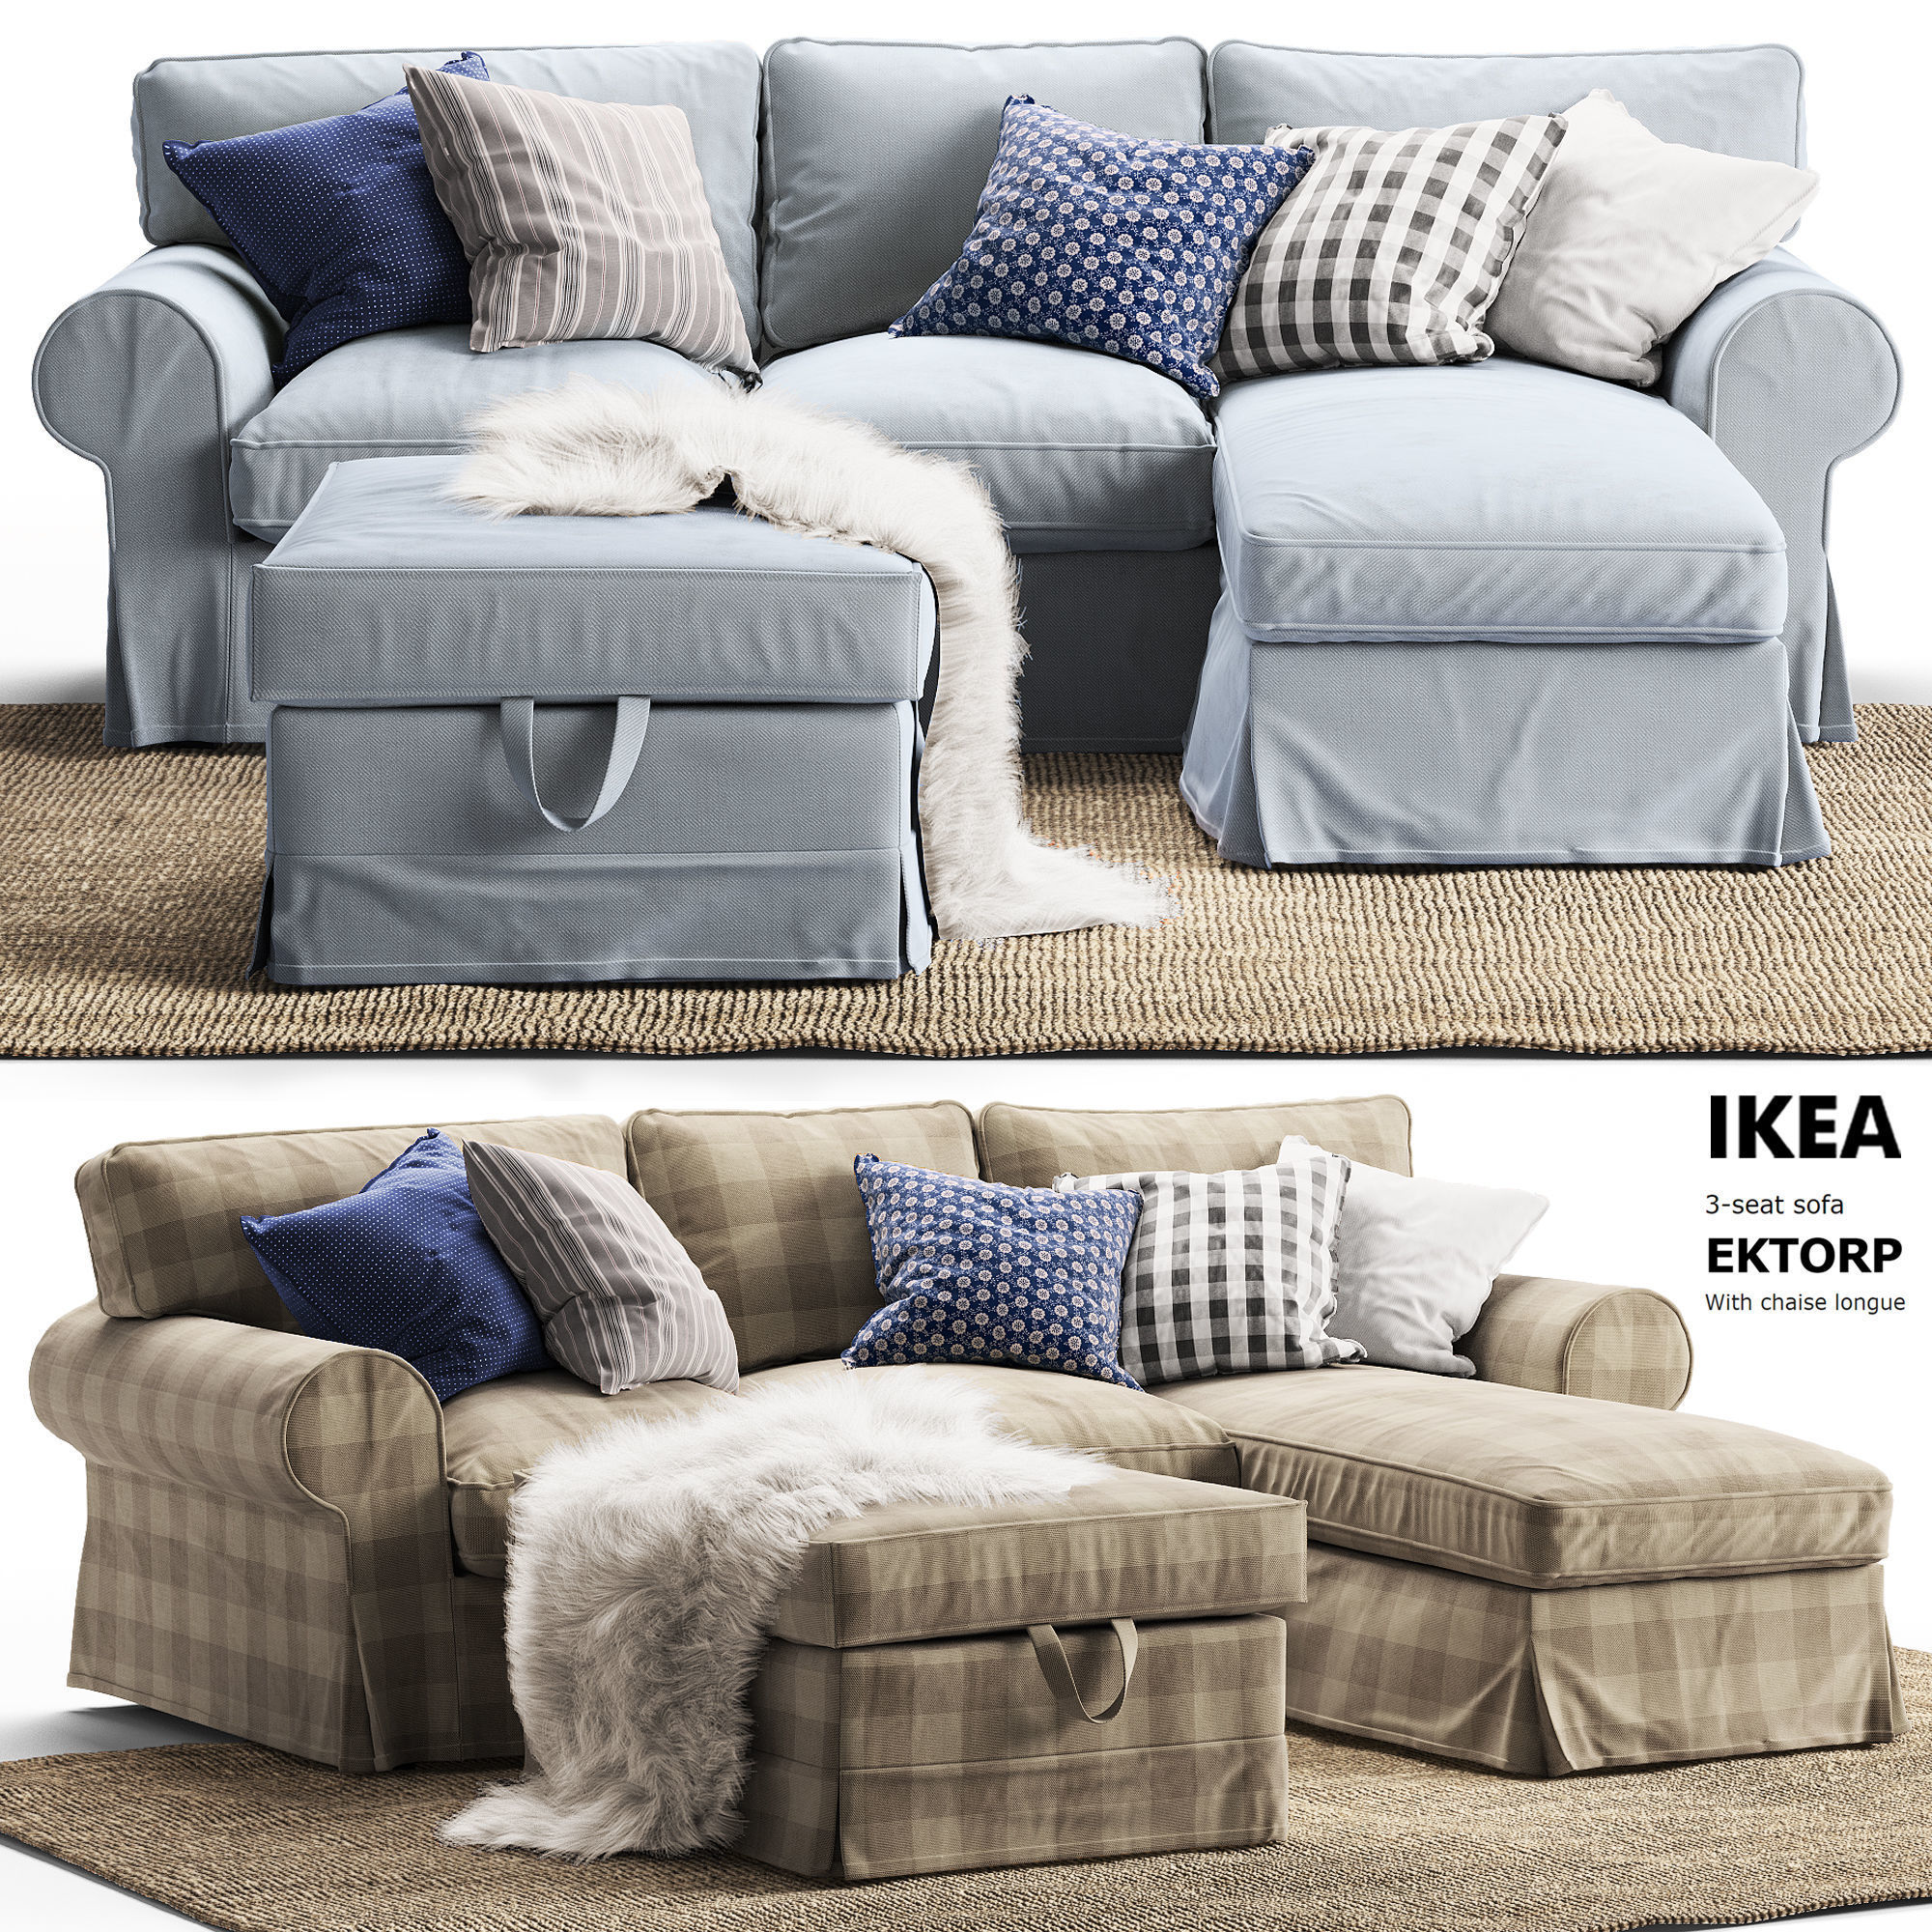 Sofa Chaise Longue Ikea.3 Seat Sofa Ektorp With Chaise Longue Ikea 3d Model